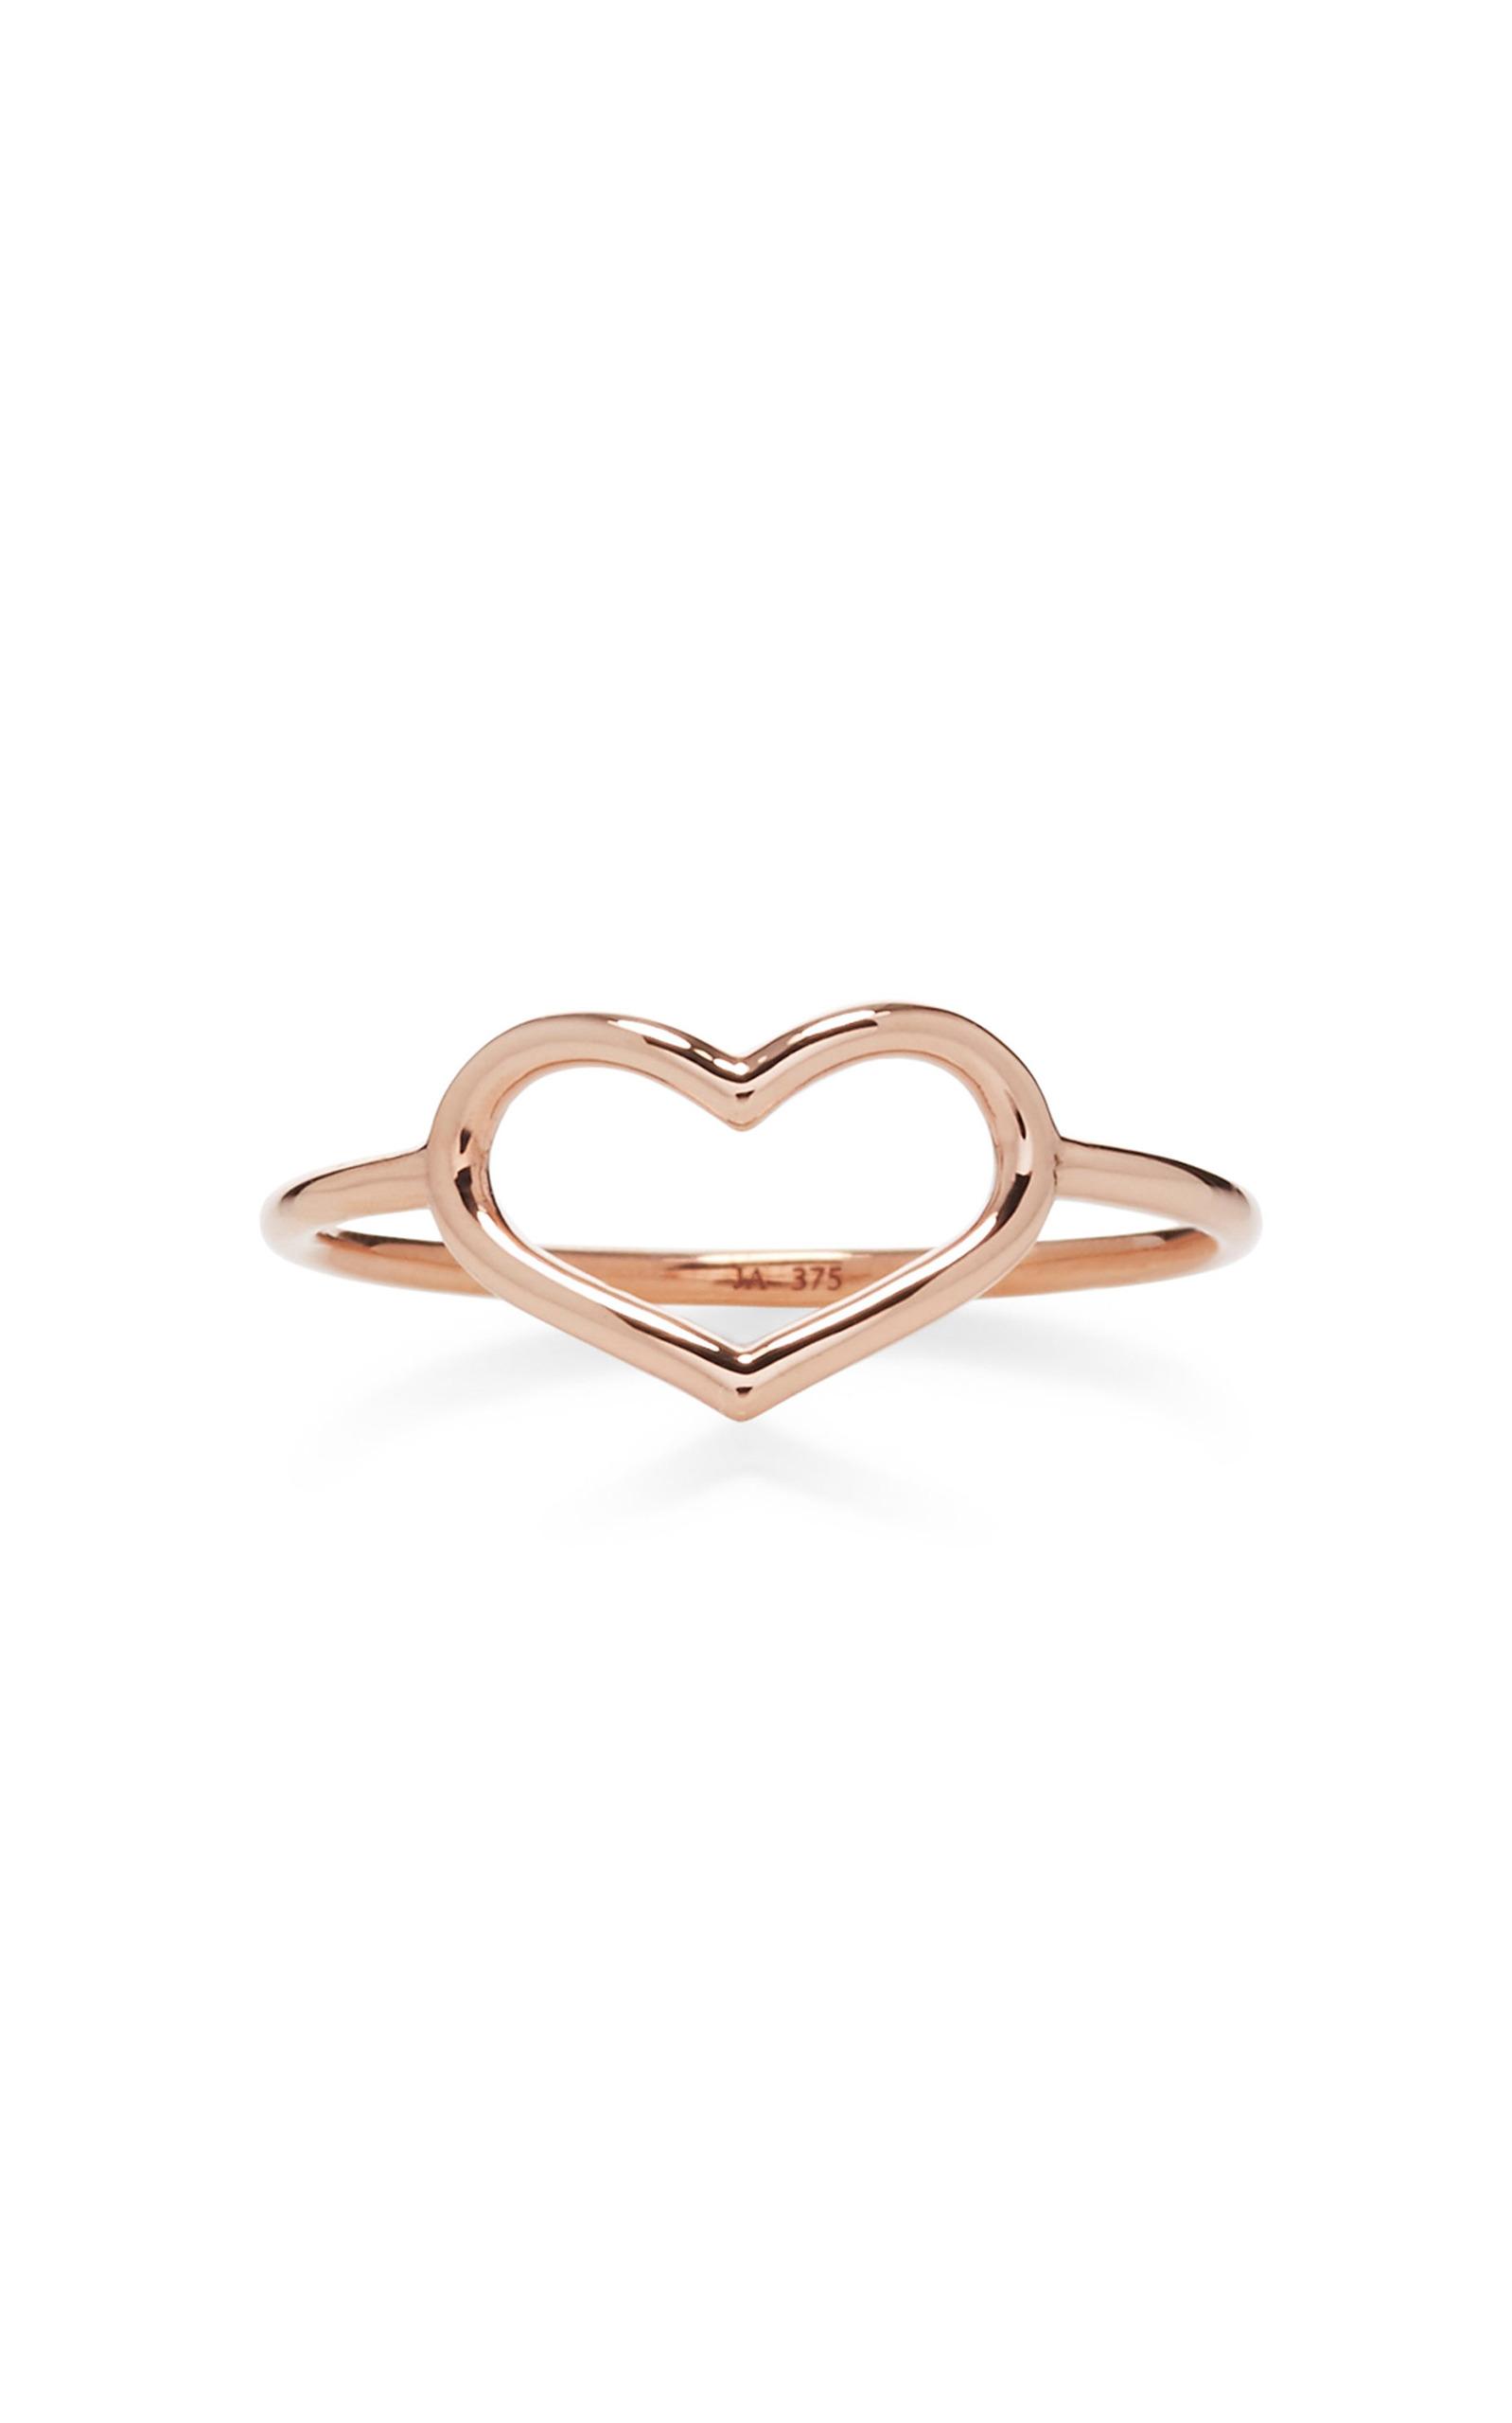 Rose Gold Delicate Heart Ring by Jordan Askill | Moda Operandi